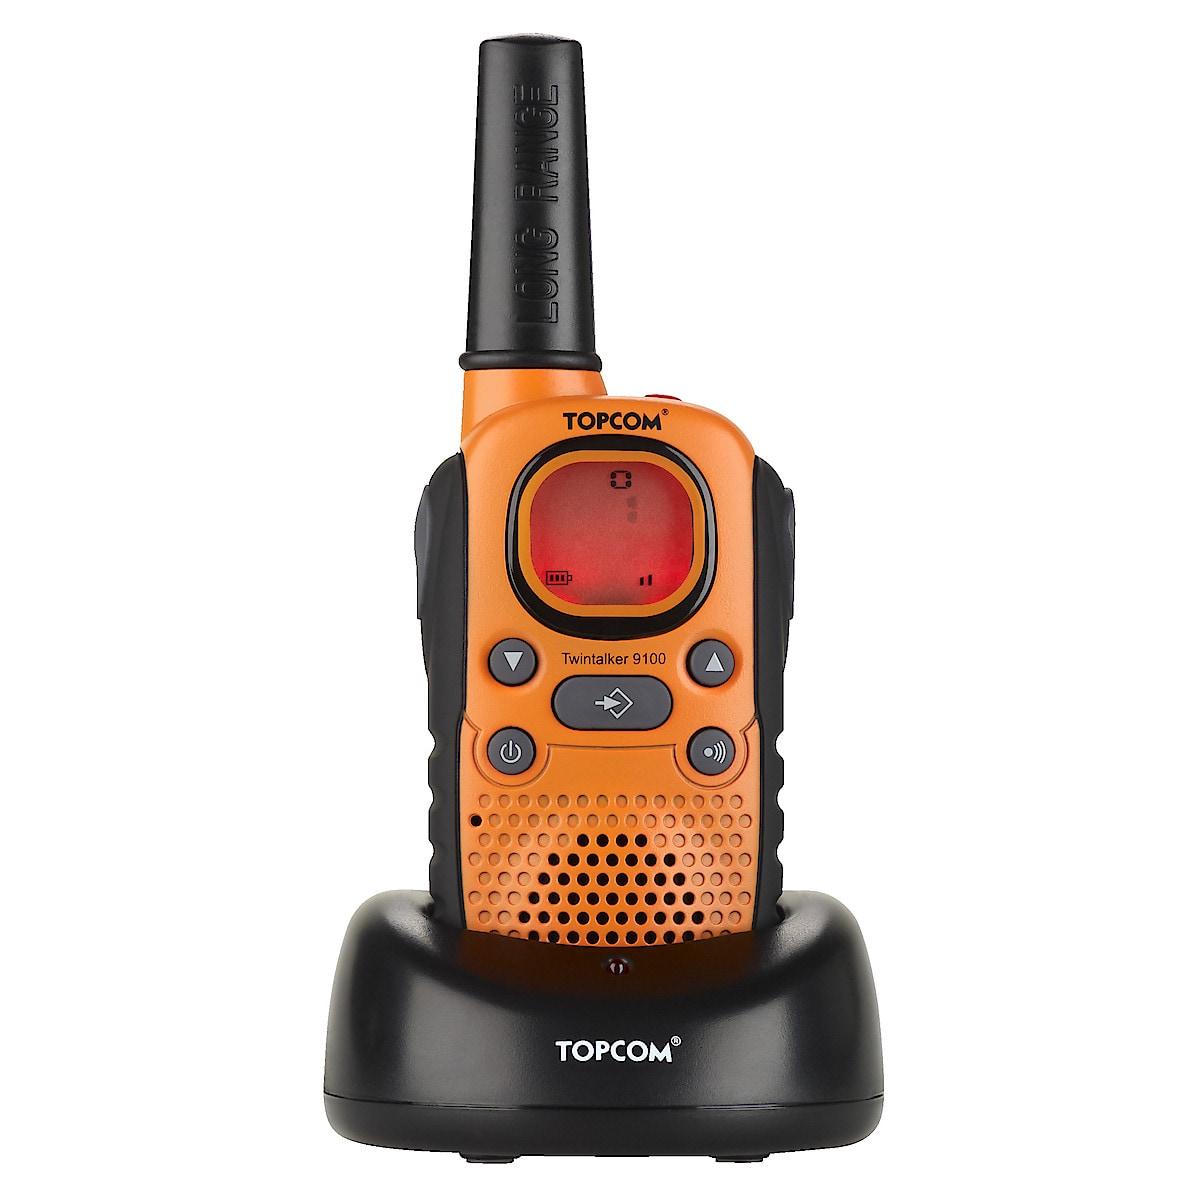 PMR Topcom Twintalker 9100